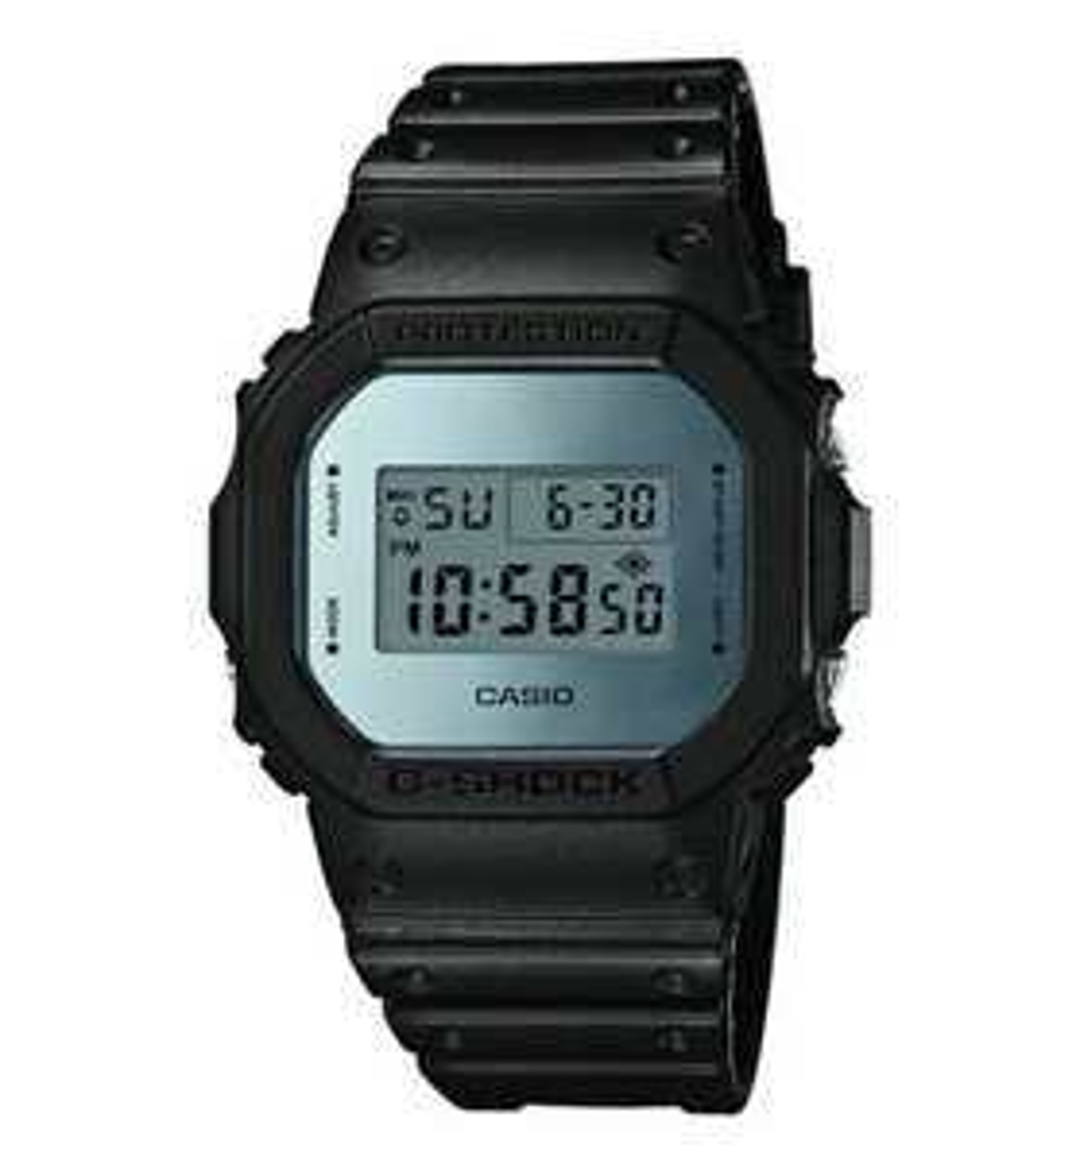 Montre Casio G-shock DW-5600BBMA-1ER - Noir